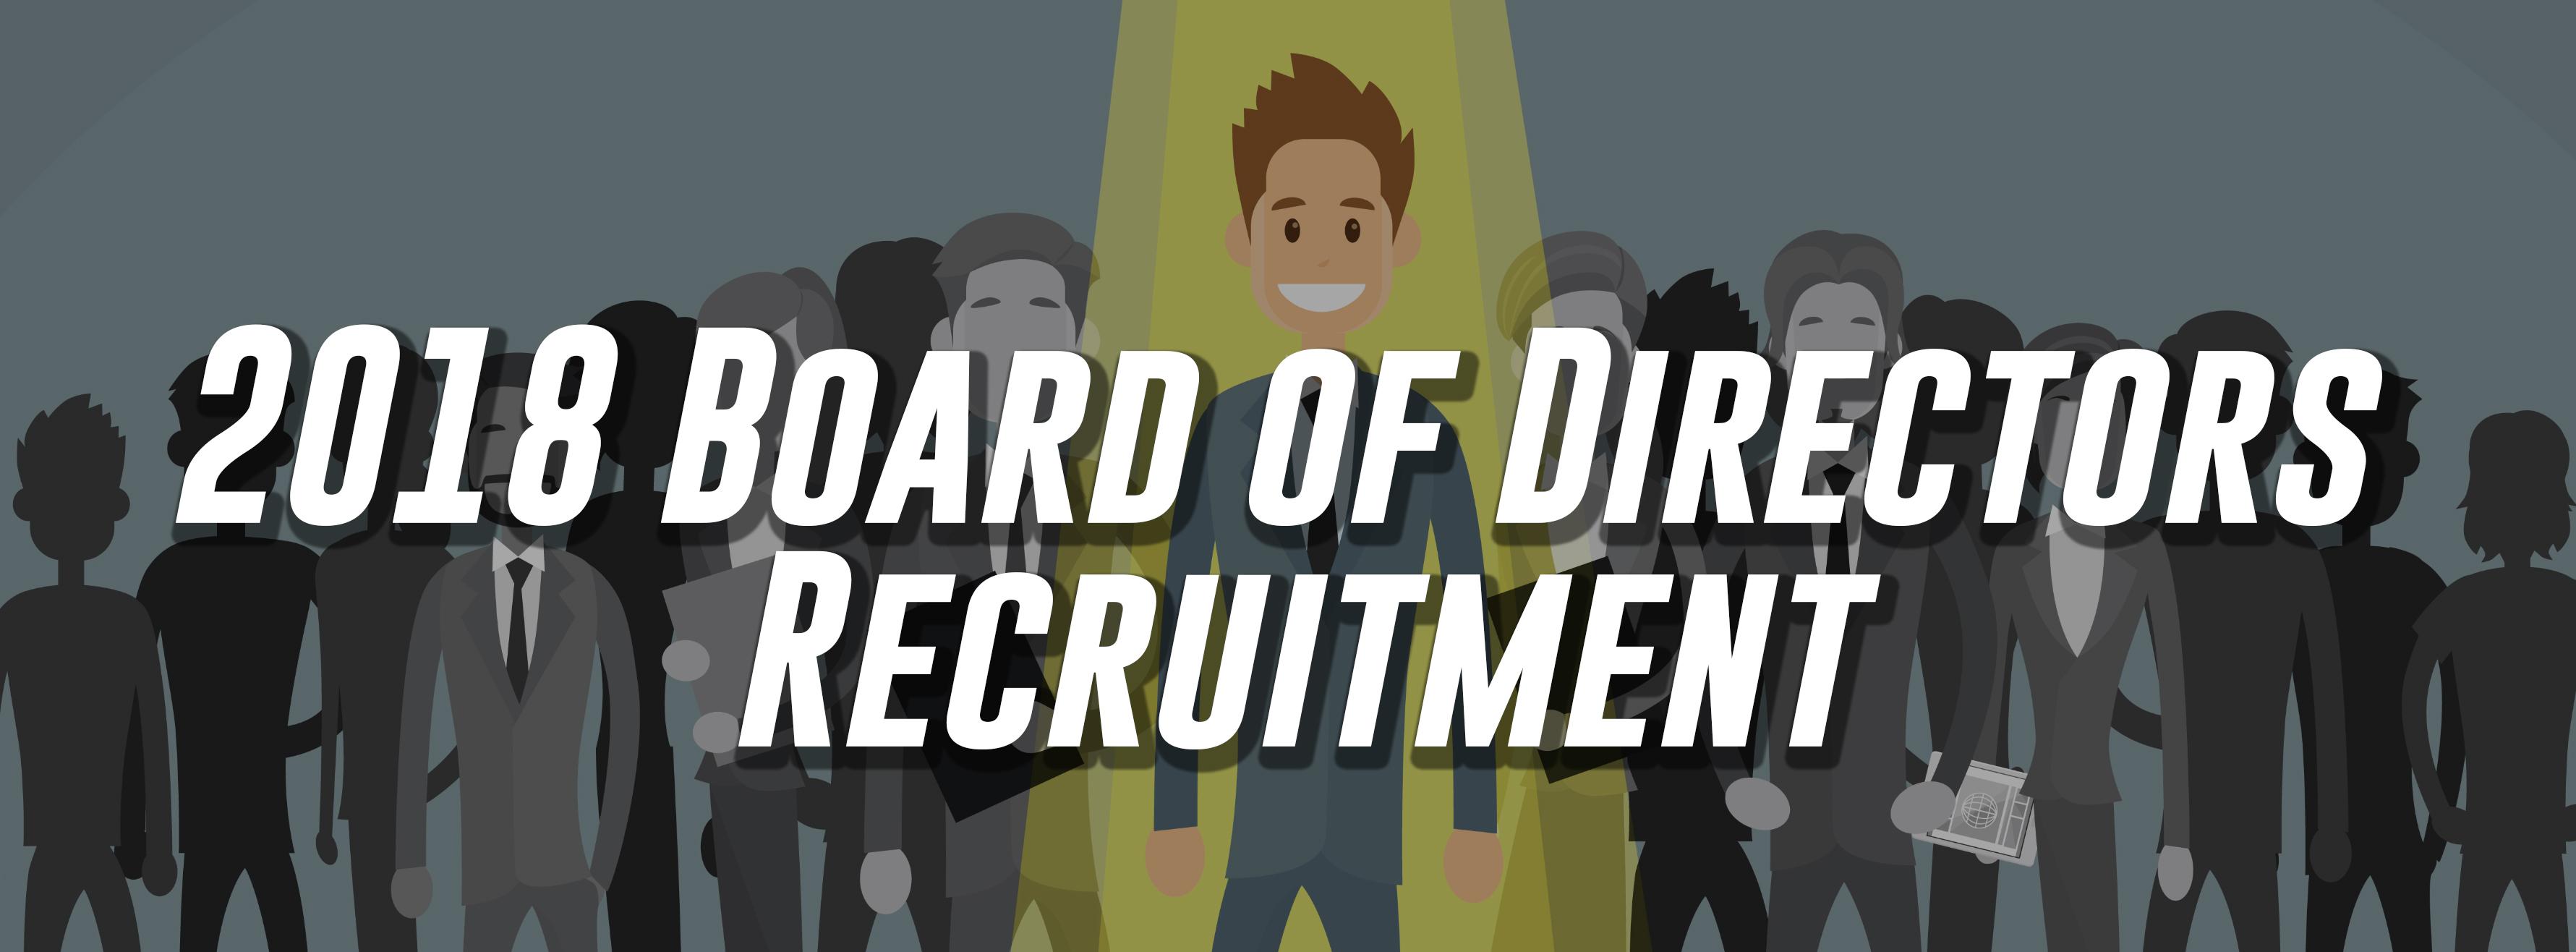 2018 Board of Director Recruitment